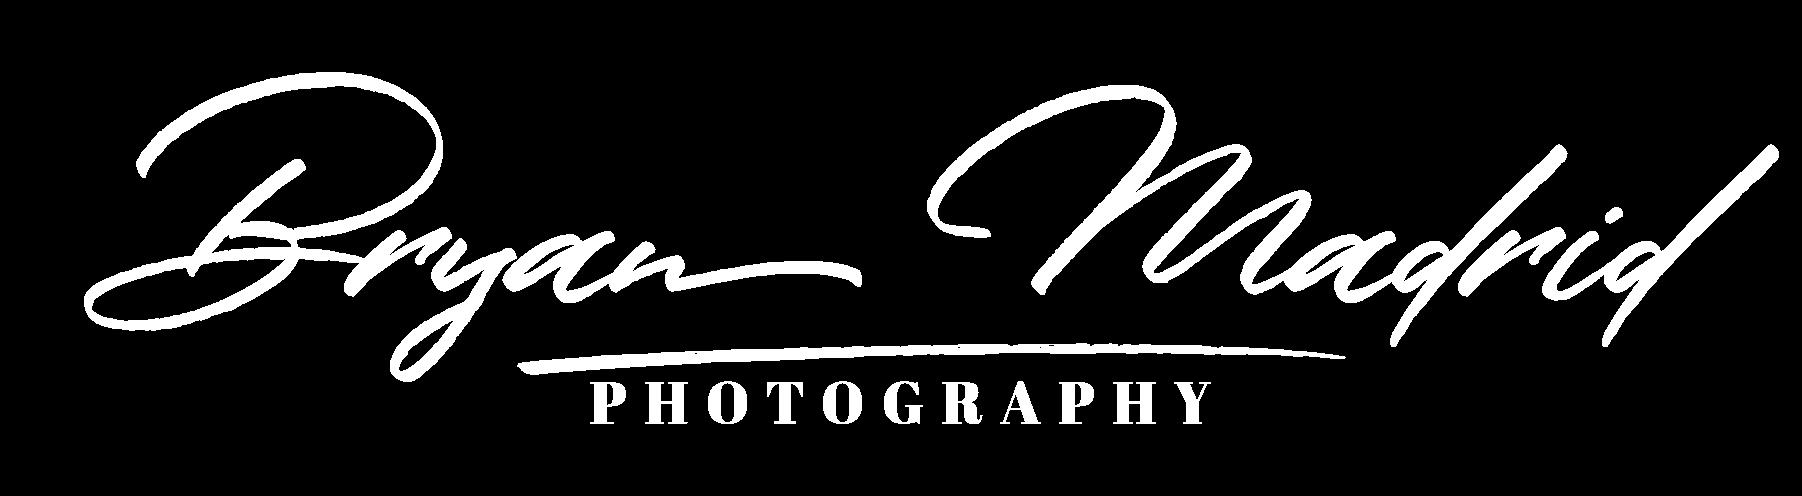 Bryan Madrid Photography